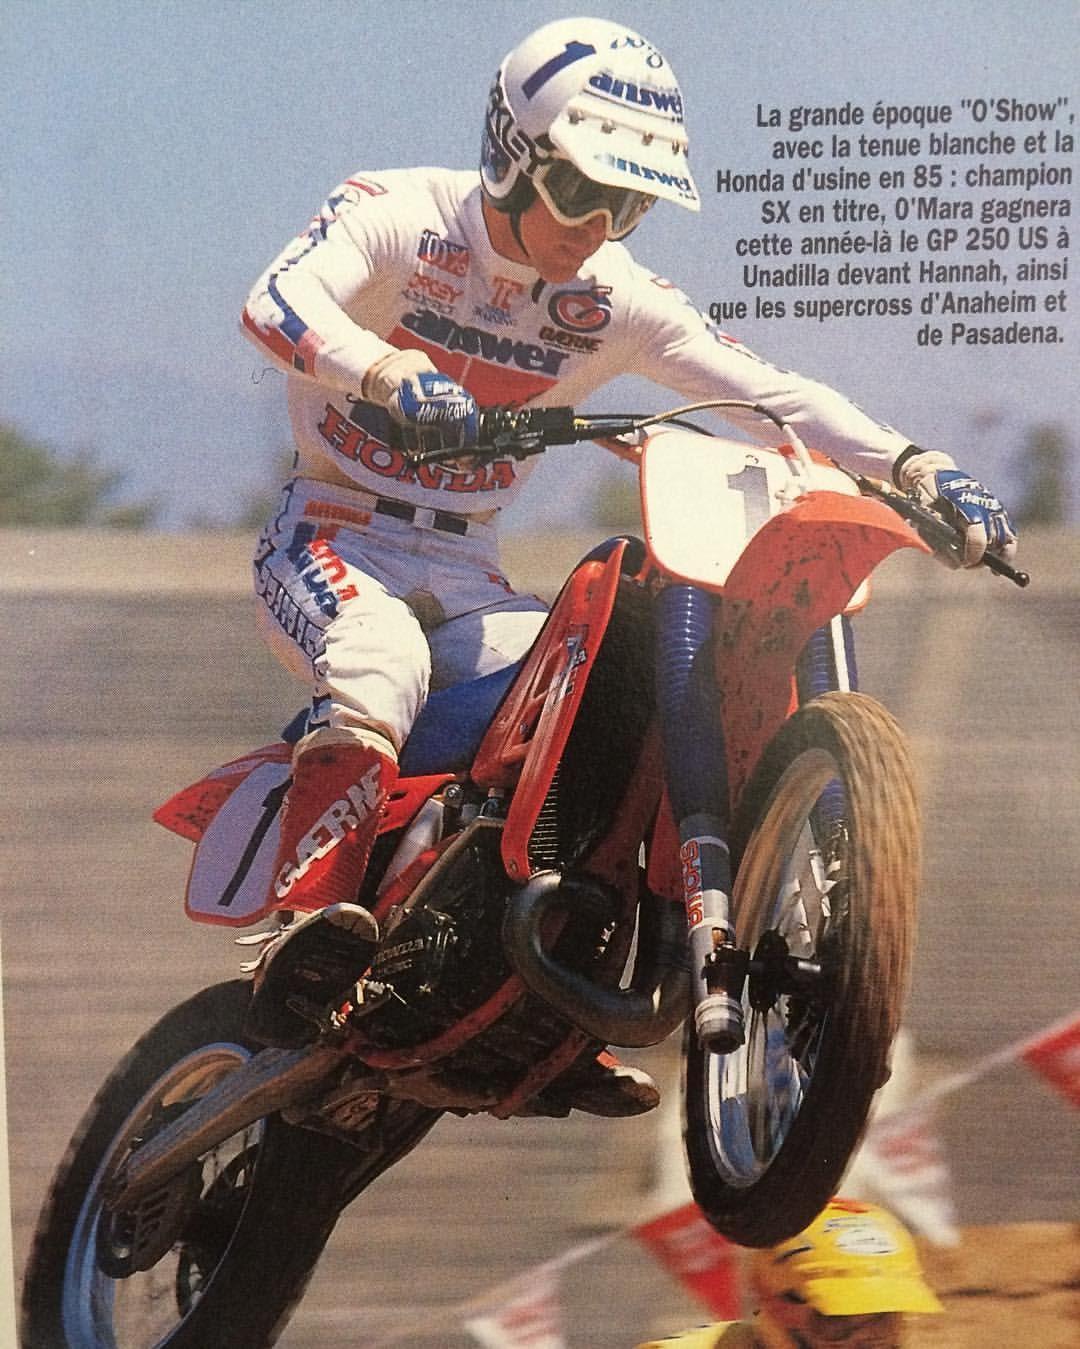 1985 Honda 250 Works Johnny O Mara Great Season And Career Teamhondahrc Johnnyomara Oshow1 Answerv Le Damien Vu Vintage Motocross Motocross Motocross Bikes